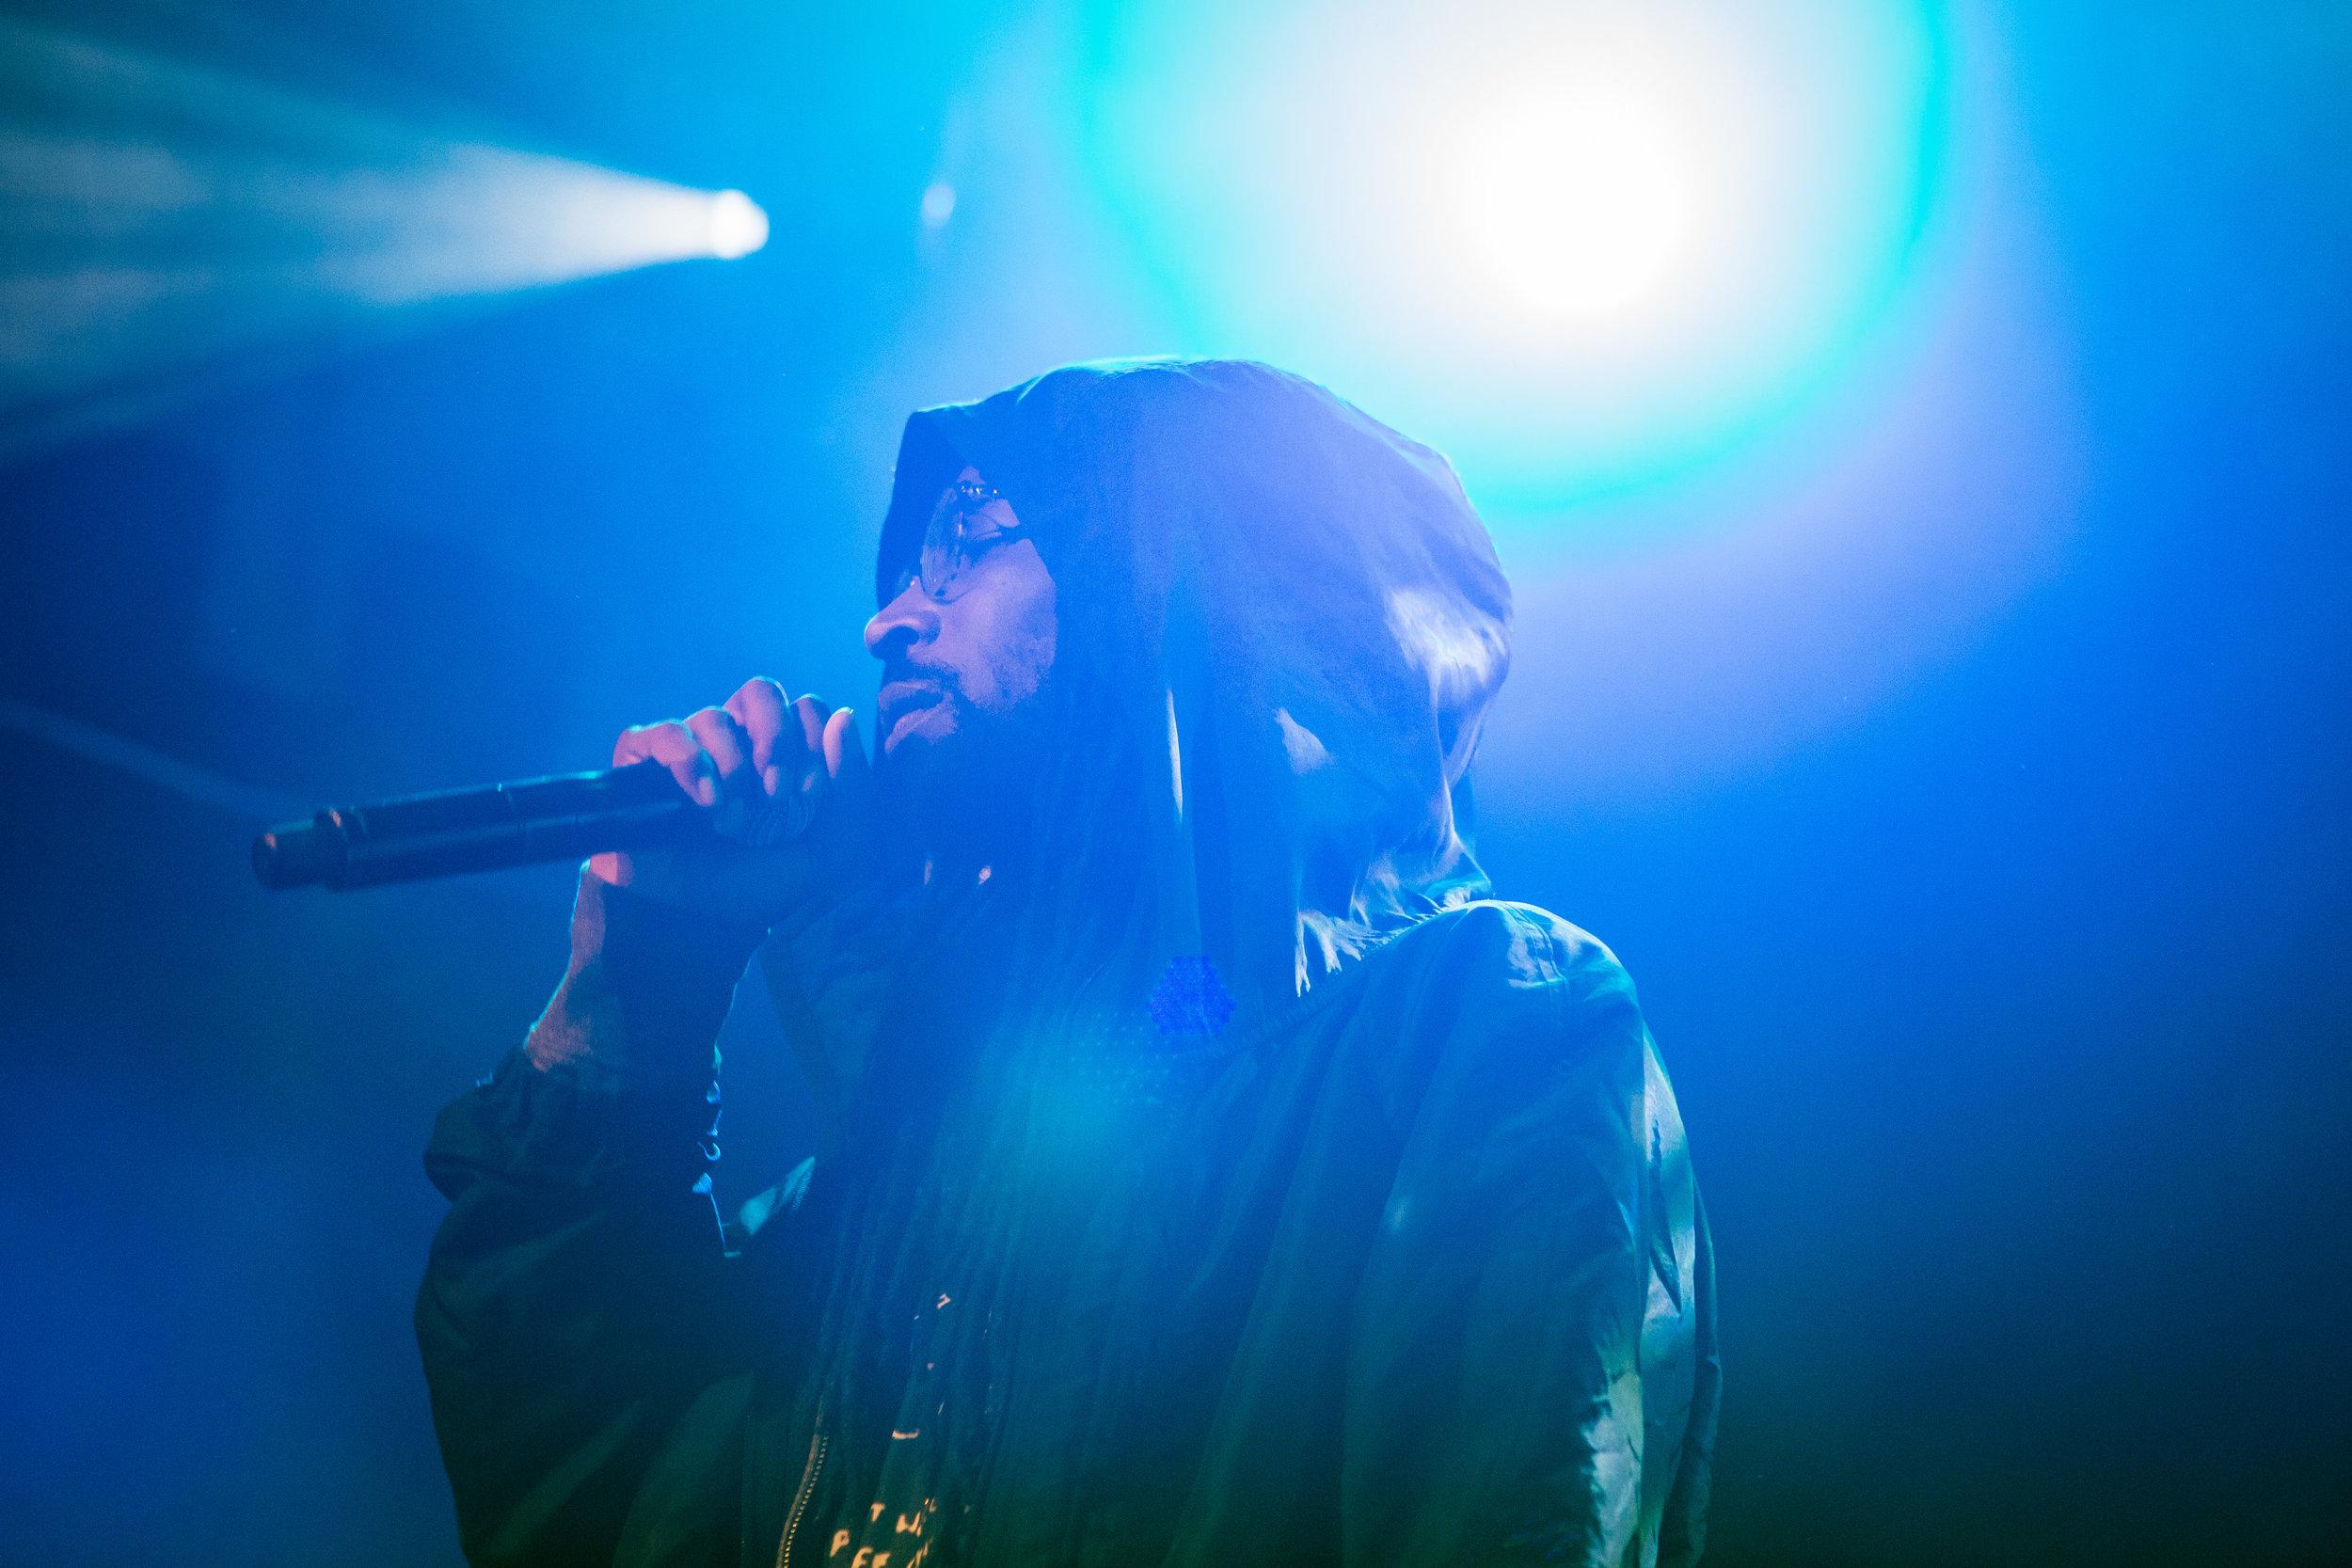 lord-of-mics-london-performance-2.jpg